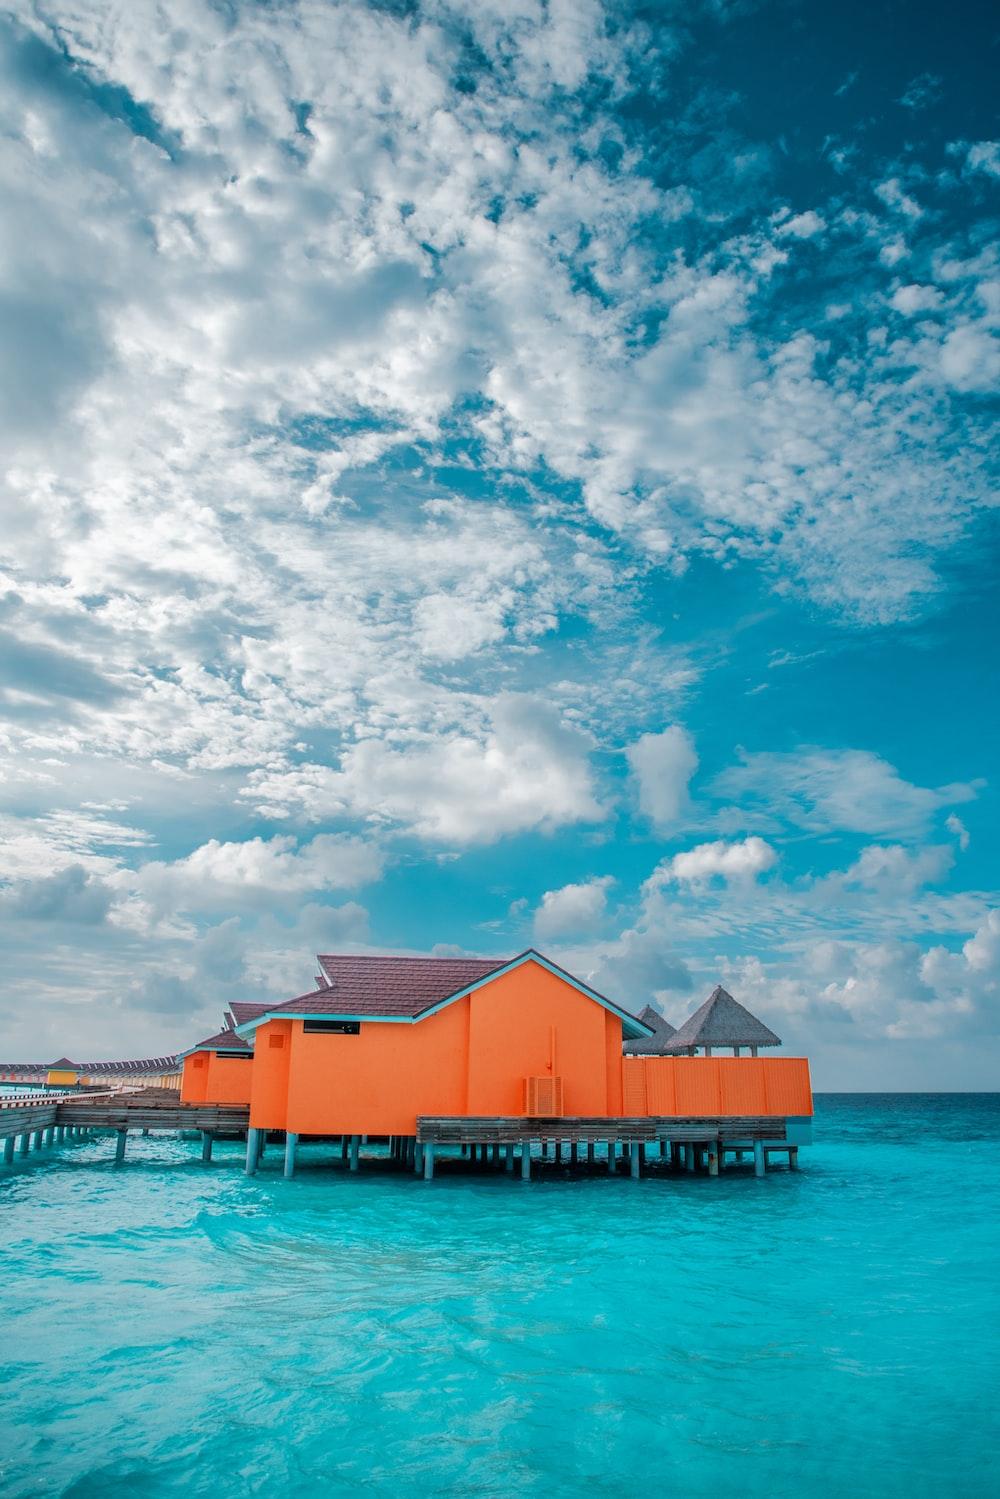 orange and grey house